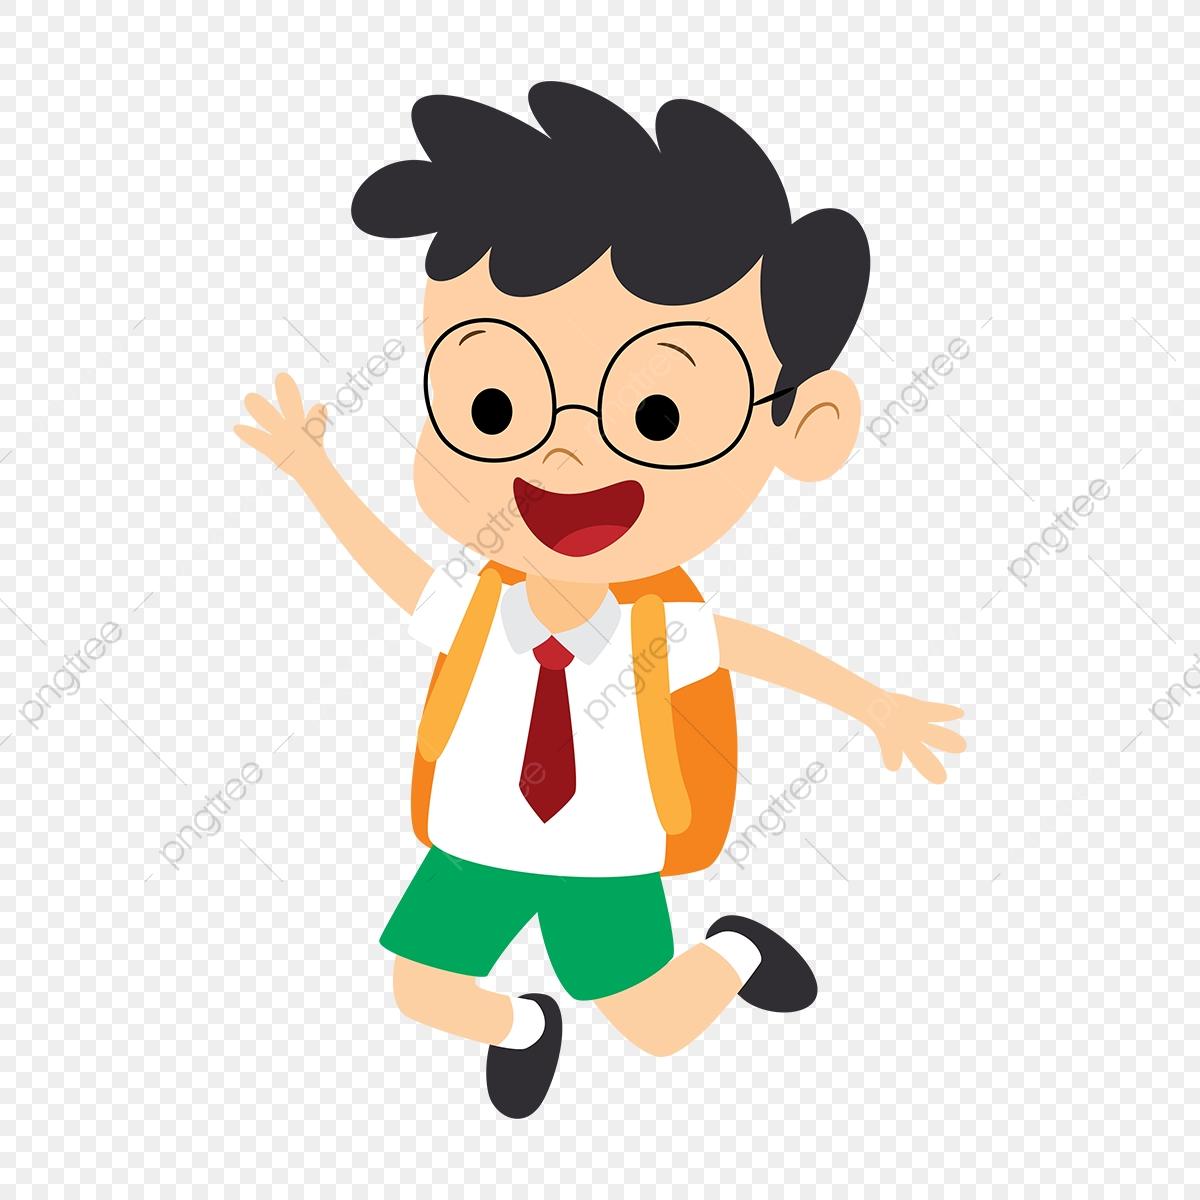 Cartoon Childrens Backpacks For The Start Of The School Season.